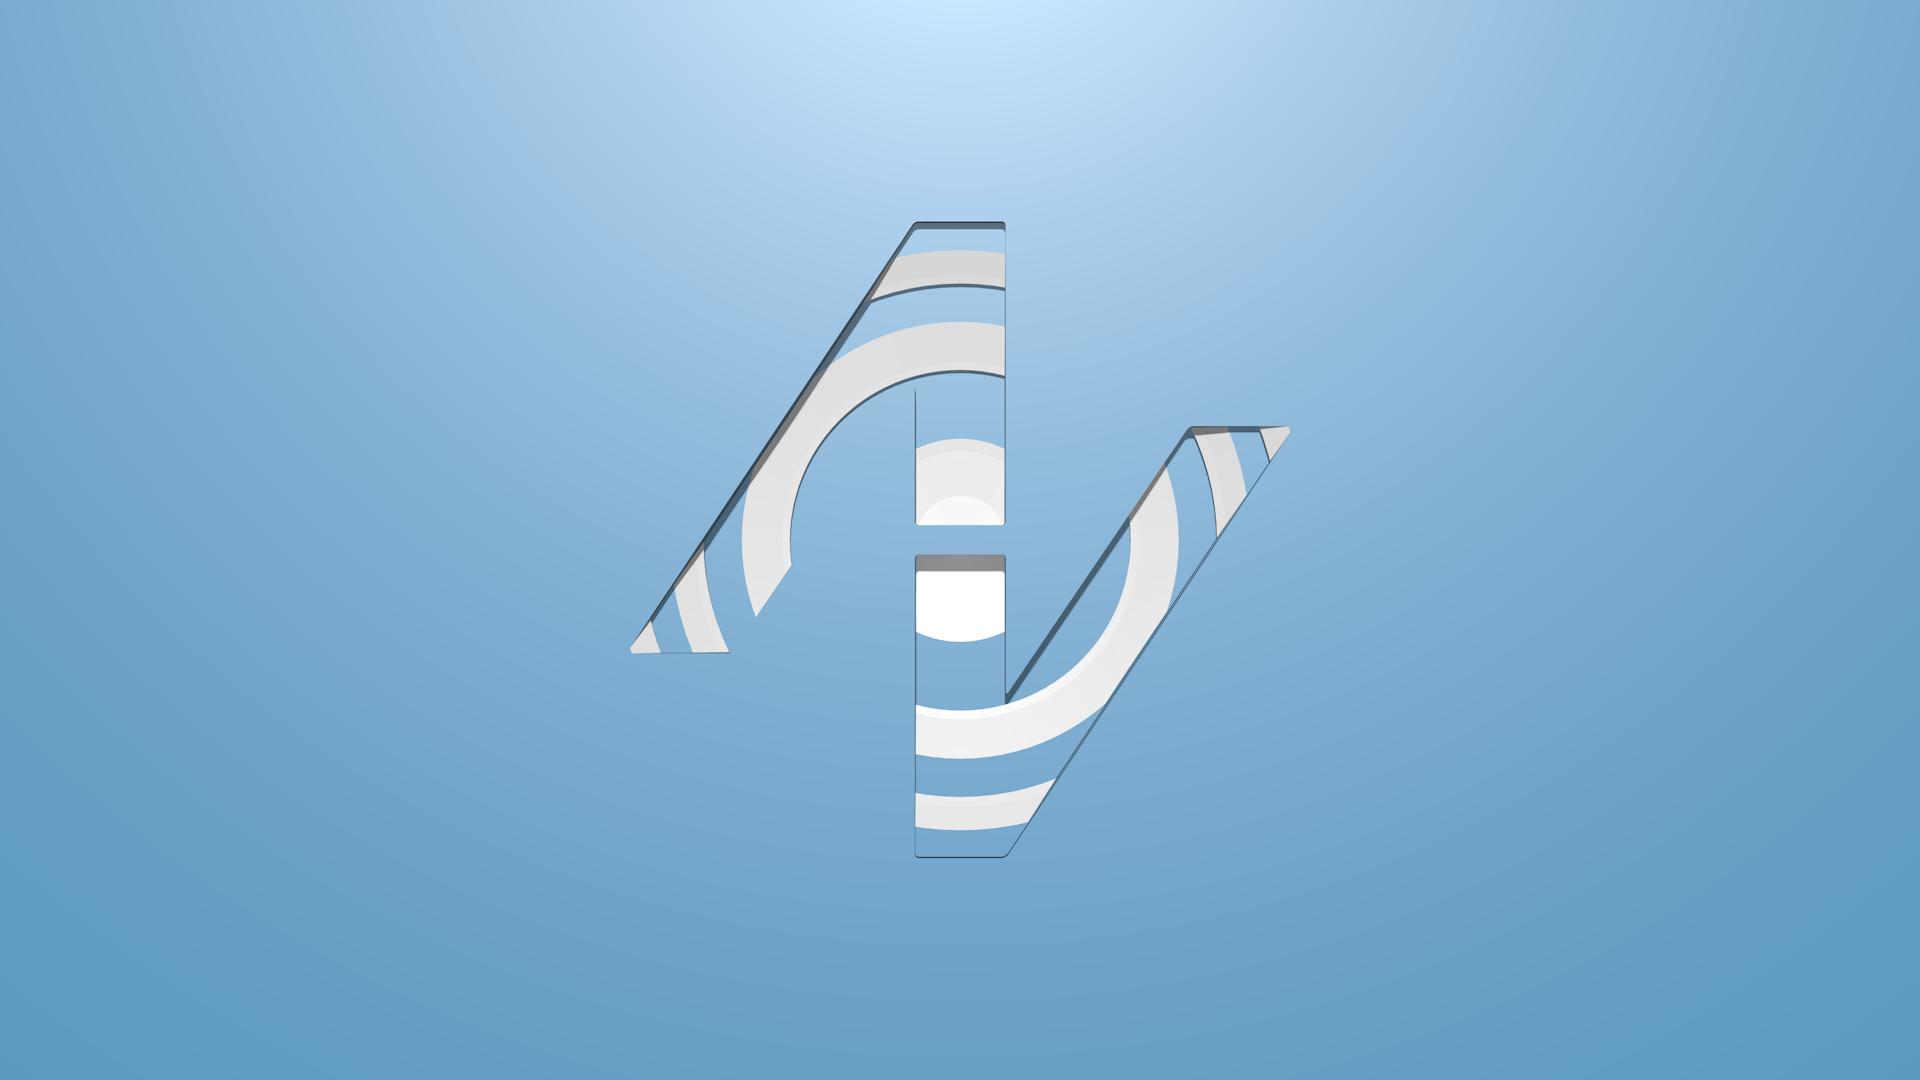 Cool Wallpaper Logo Nirvana - logo_wallpaper_2_by_omniscient_duck-d8ay2i5  Graphic_25504.png